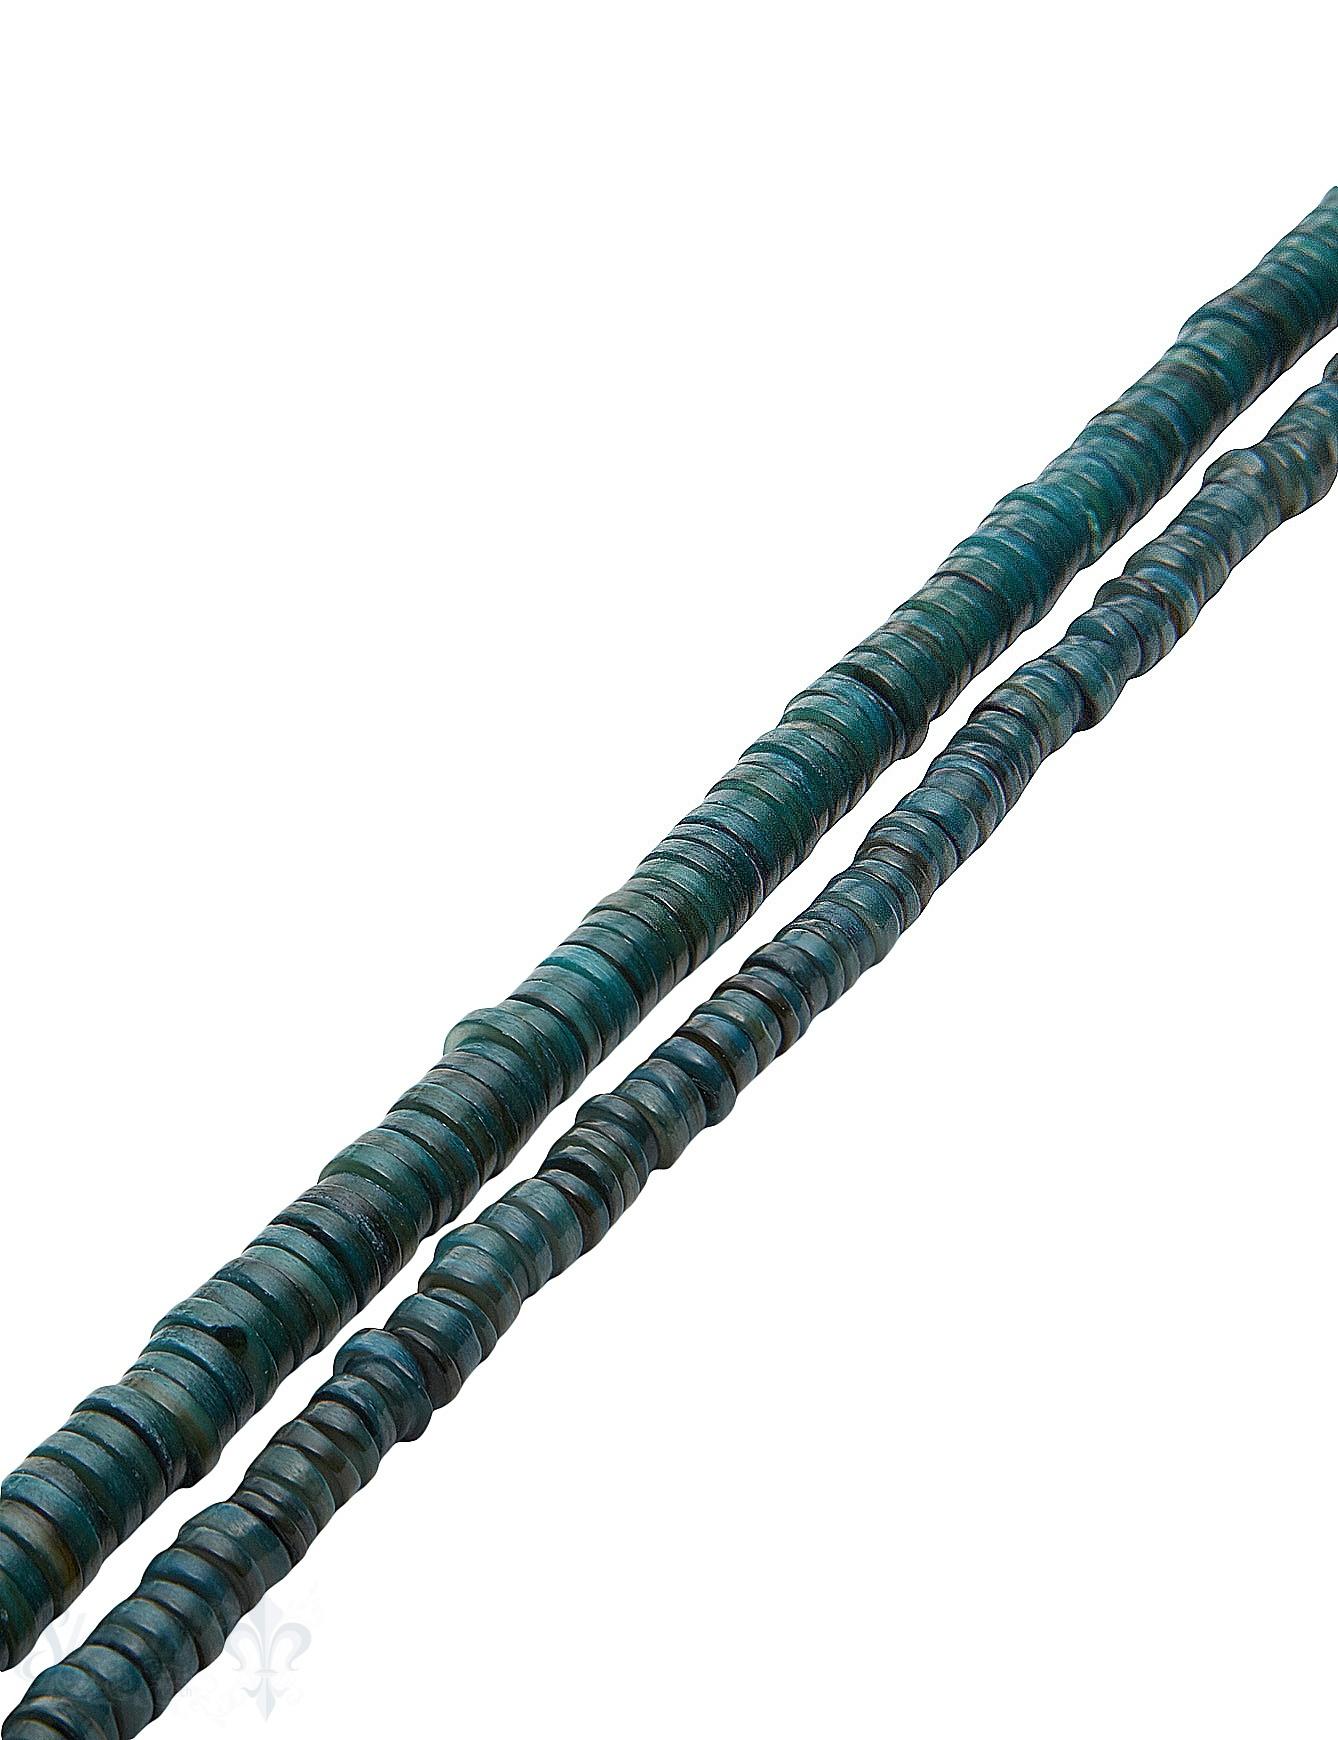 Muschel Strang petrol-blau Rondellen gefärbt